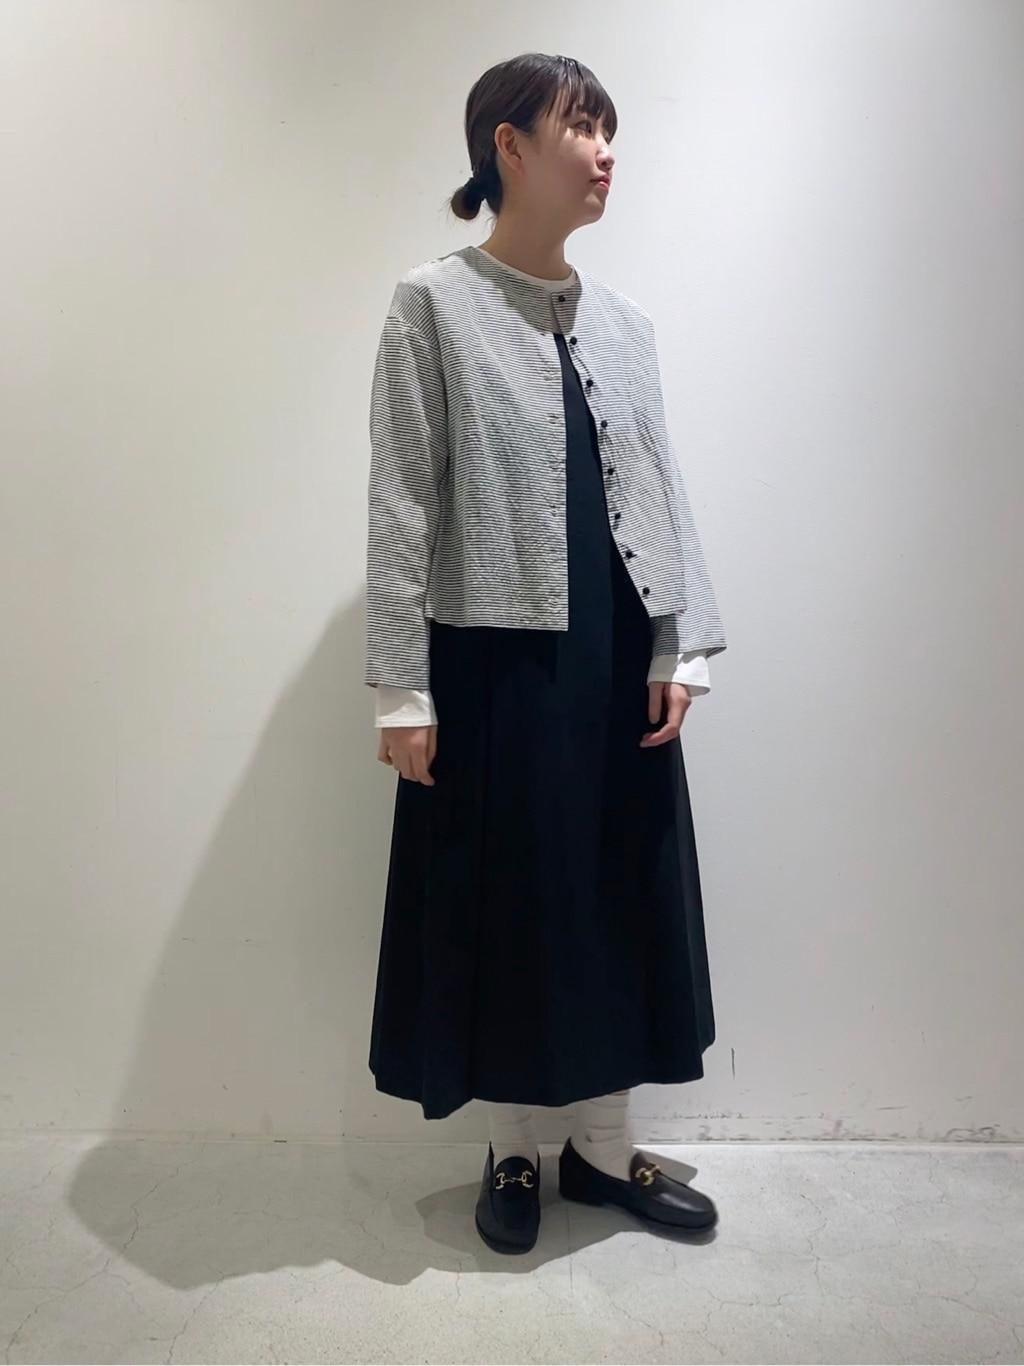 yuni 神戸路面 身長:166cm 2021.03.12